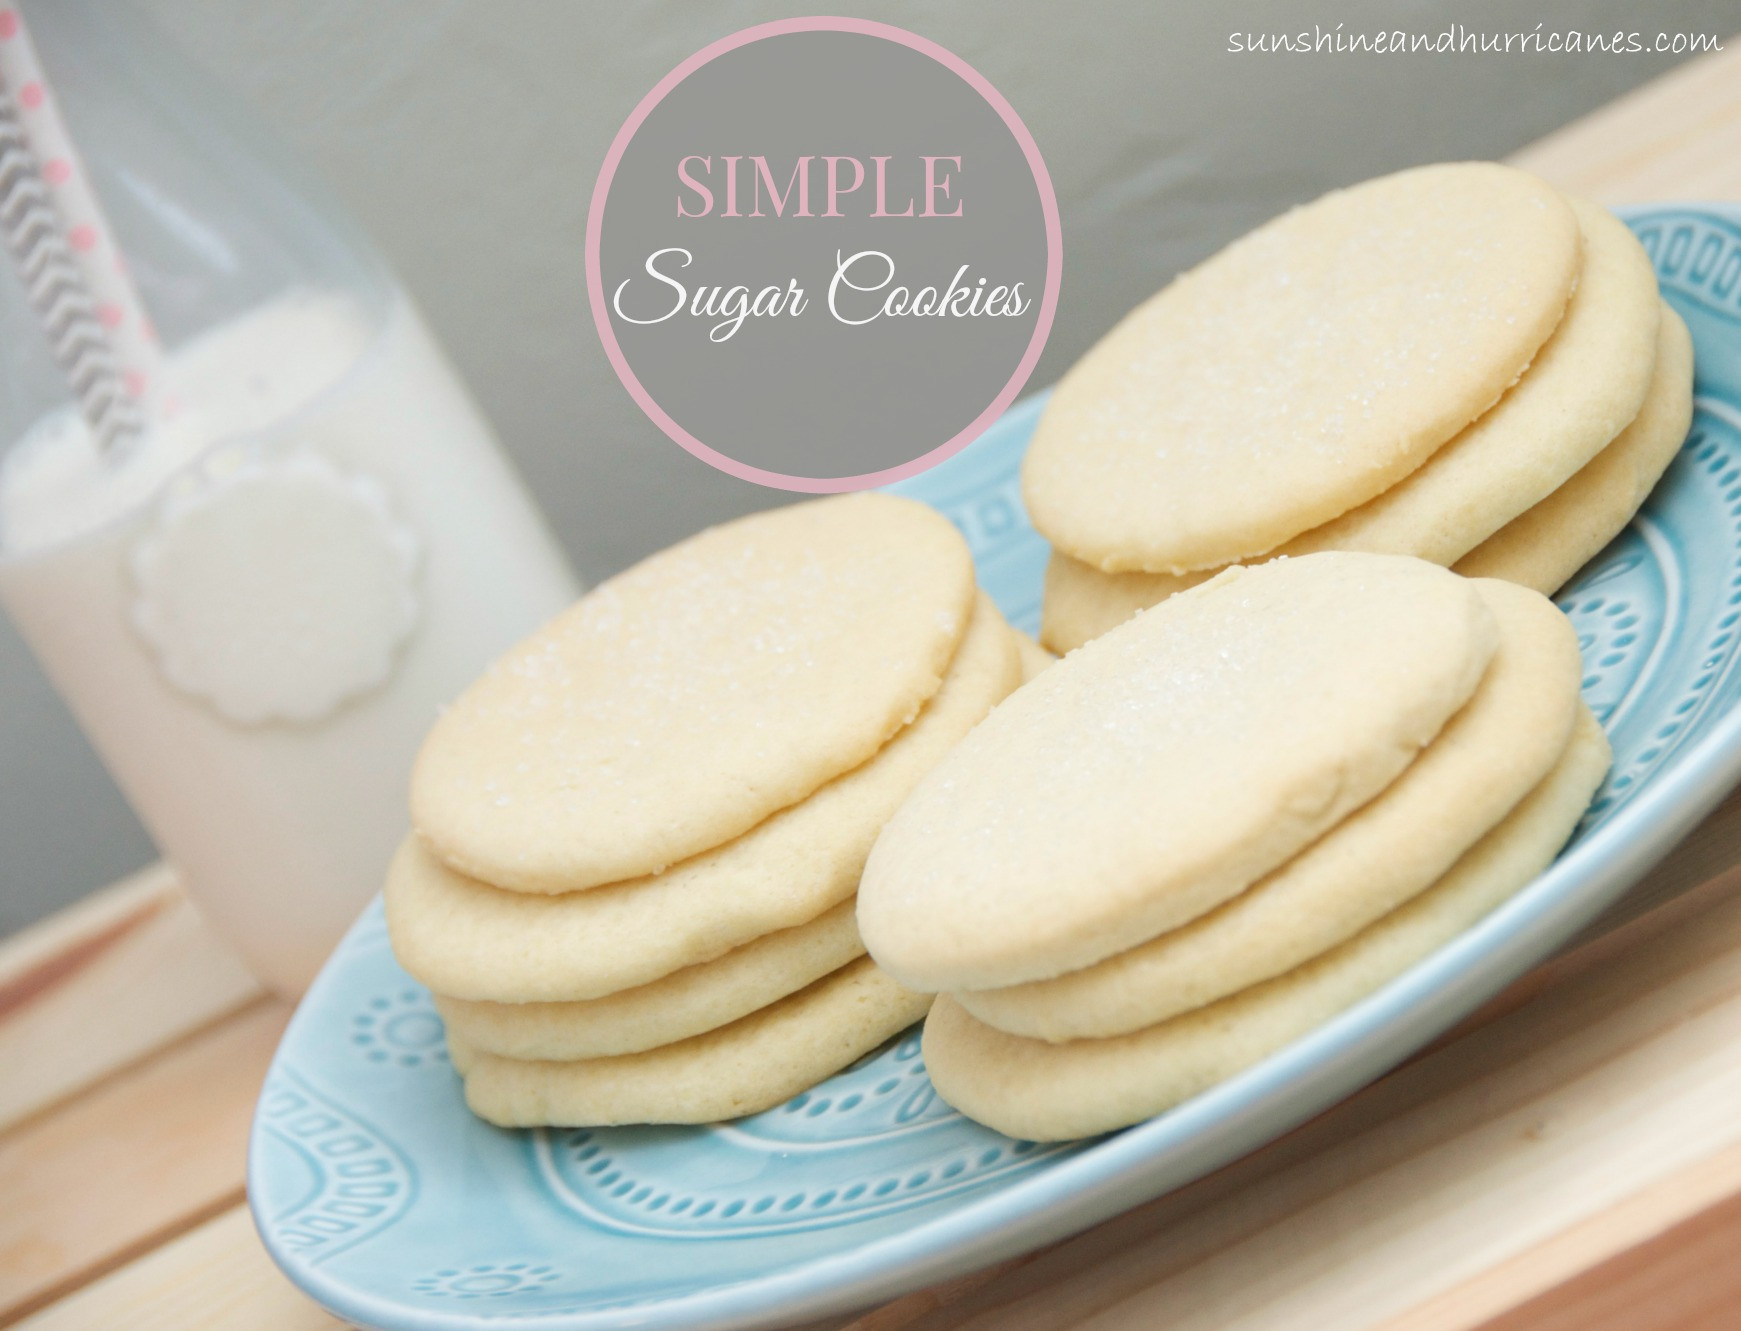 Easy Cut Out Sugar Cookies Recipes  Simple Sugar Cookies